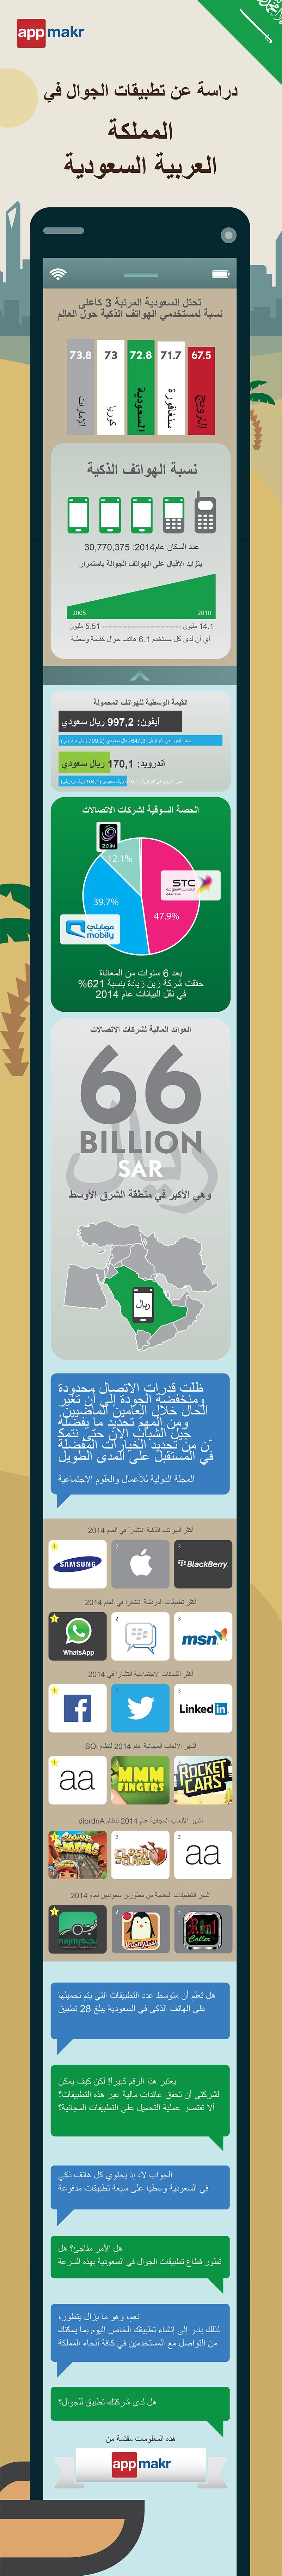 SAUDI Infographic base 3(ARABIC-WithFadiEdits)